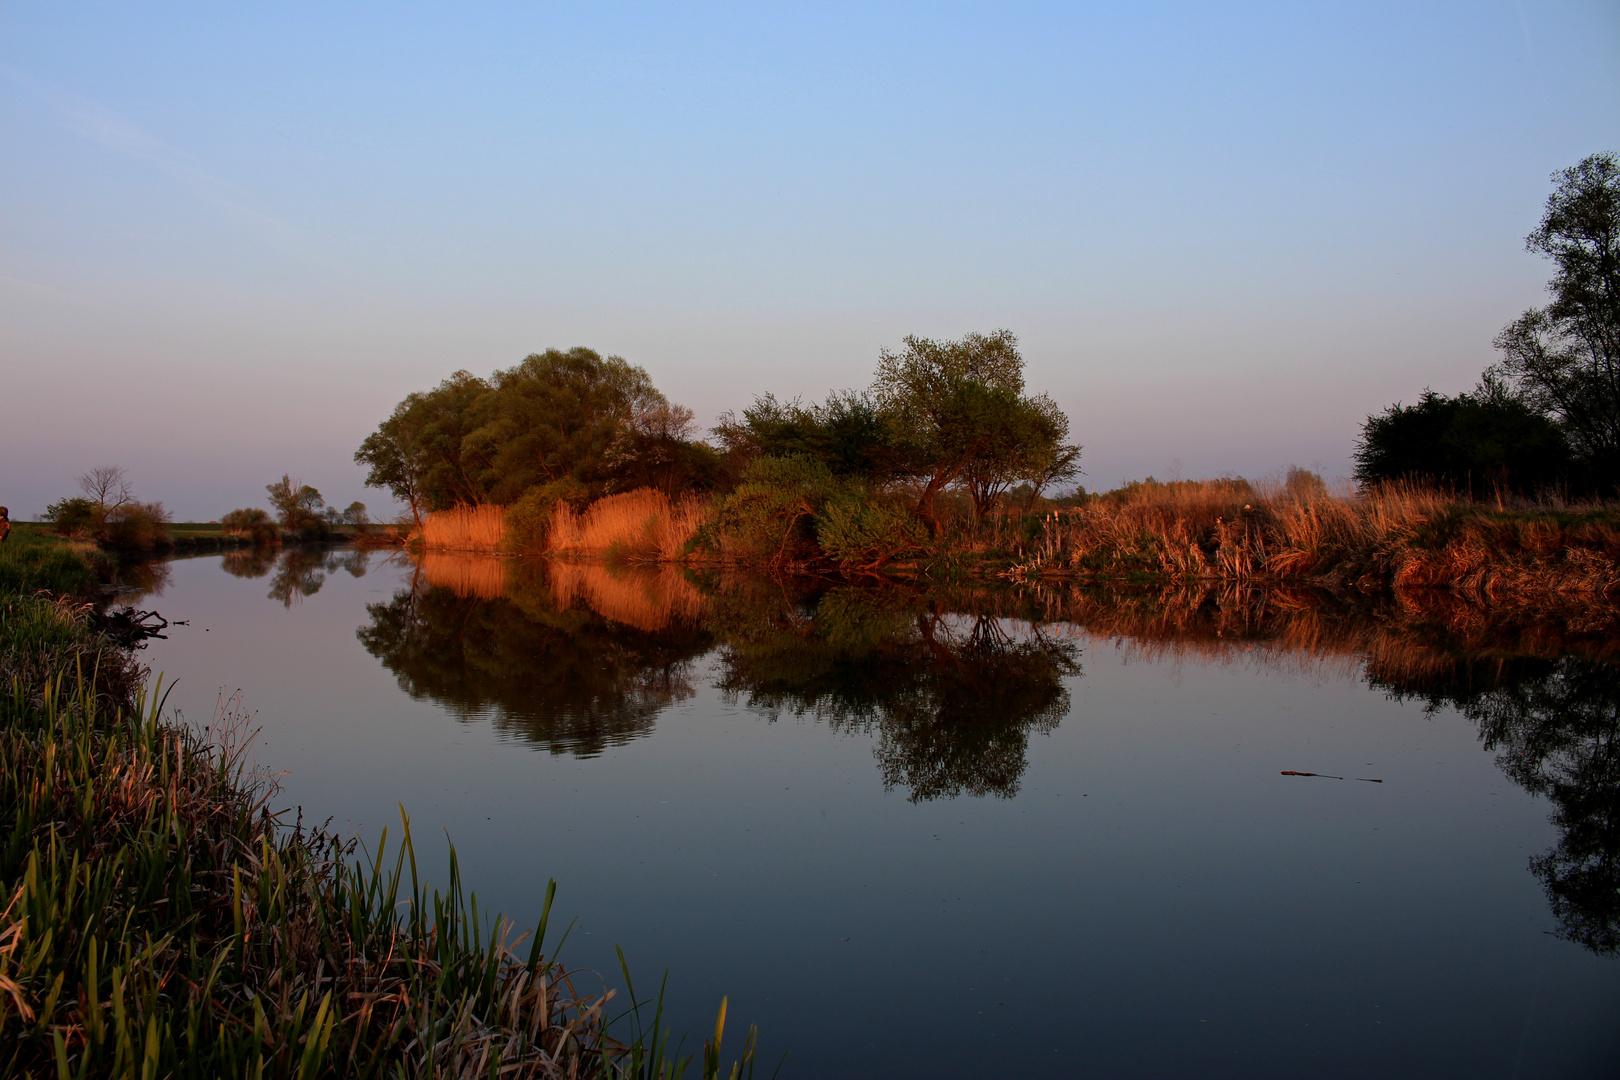 Ipoly - Sonnenuntergang im Frühling